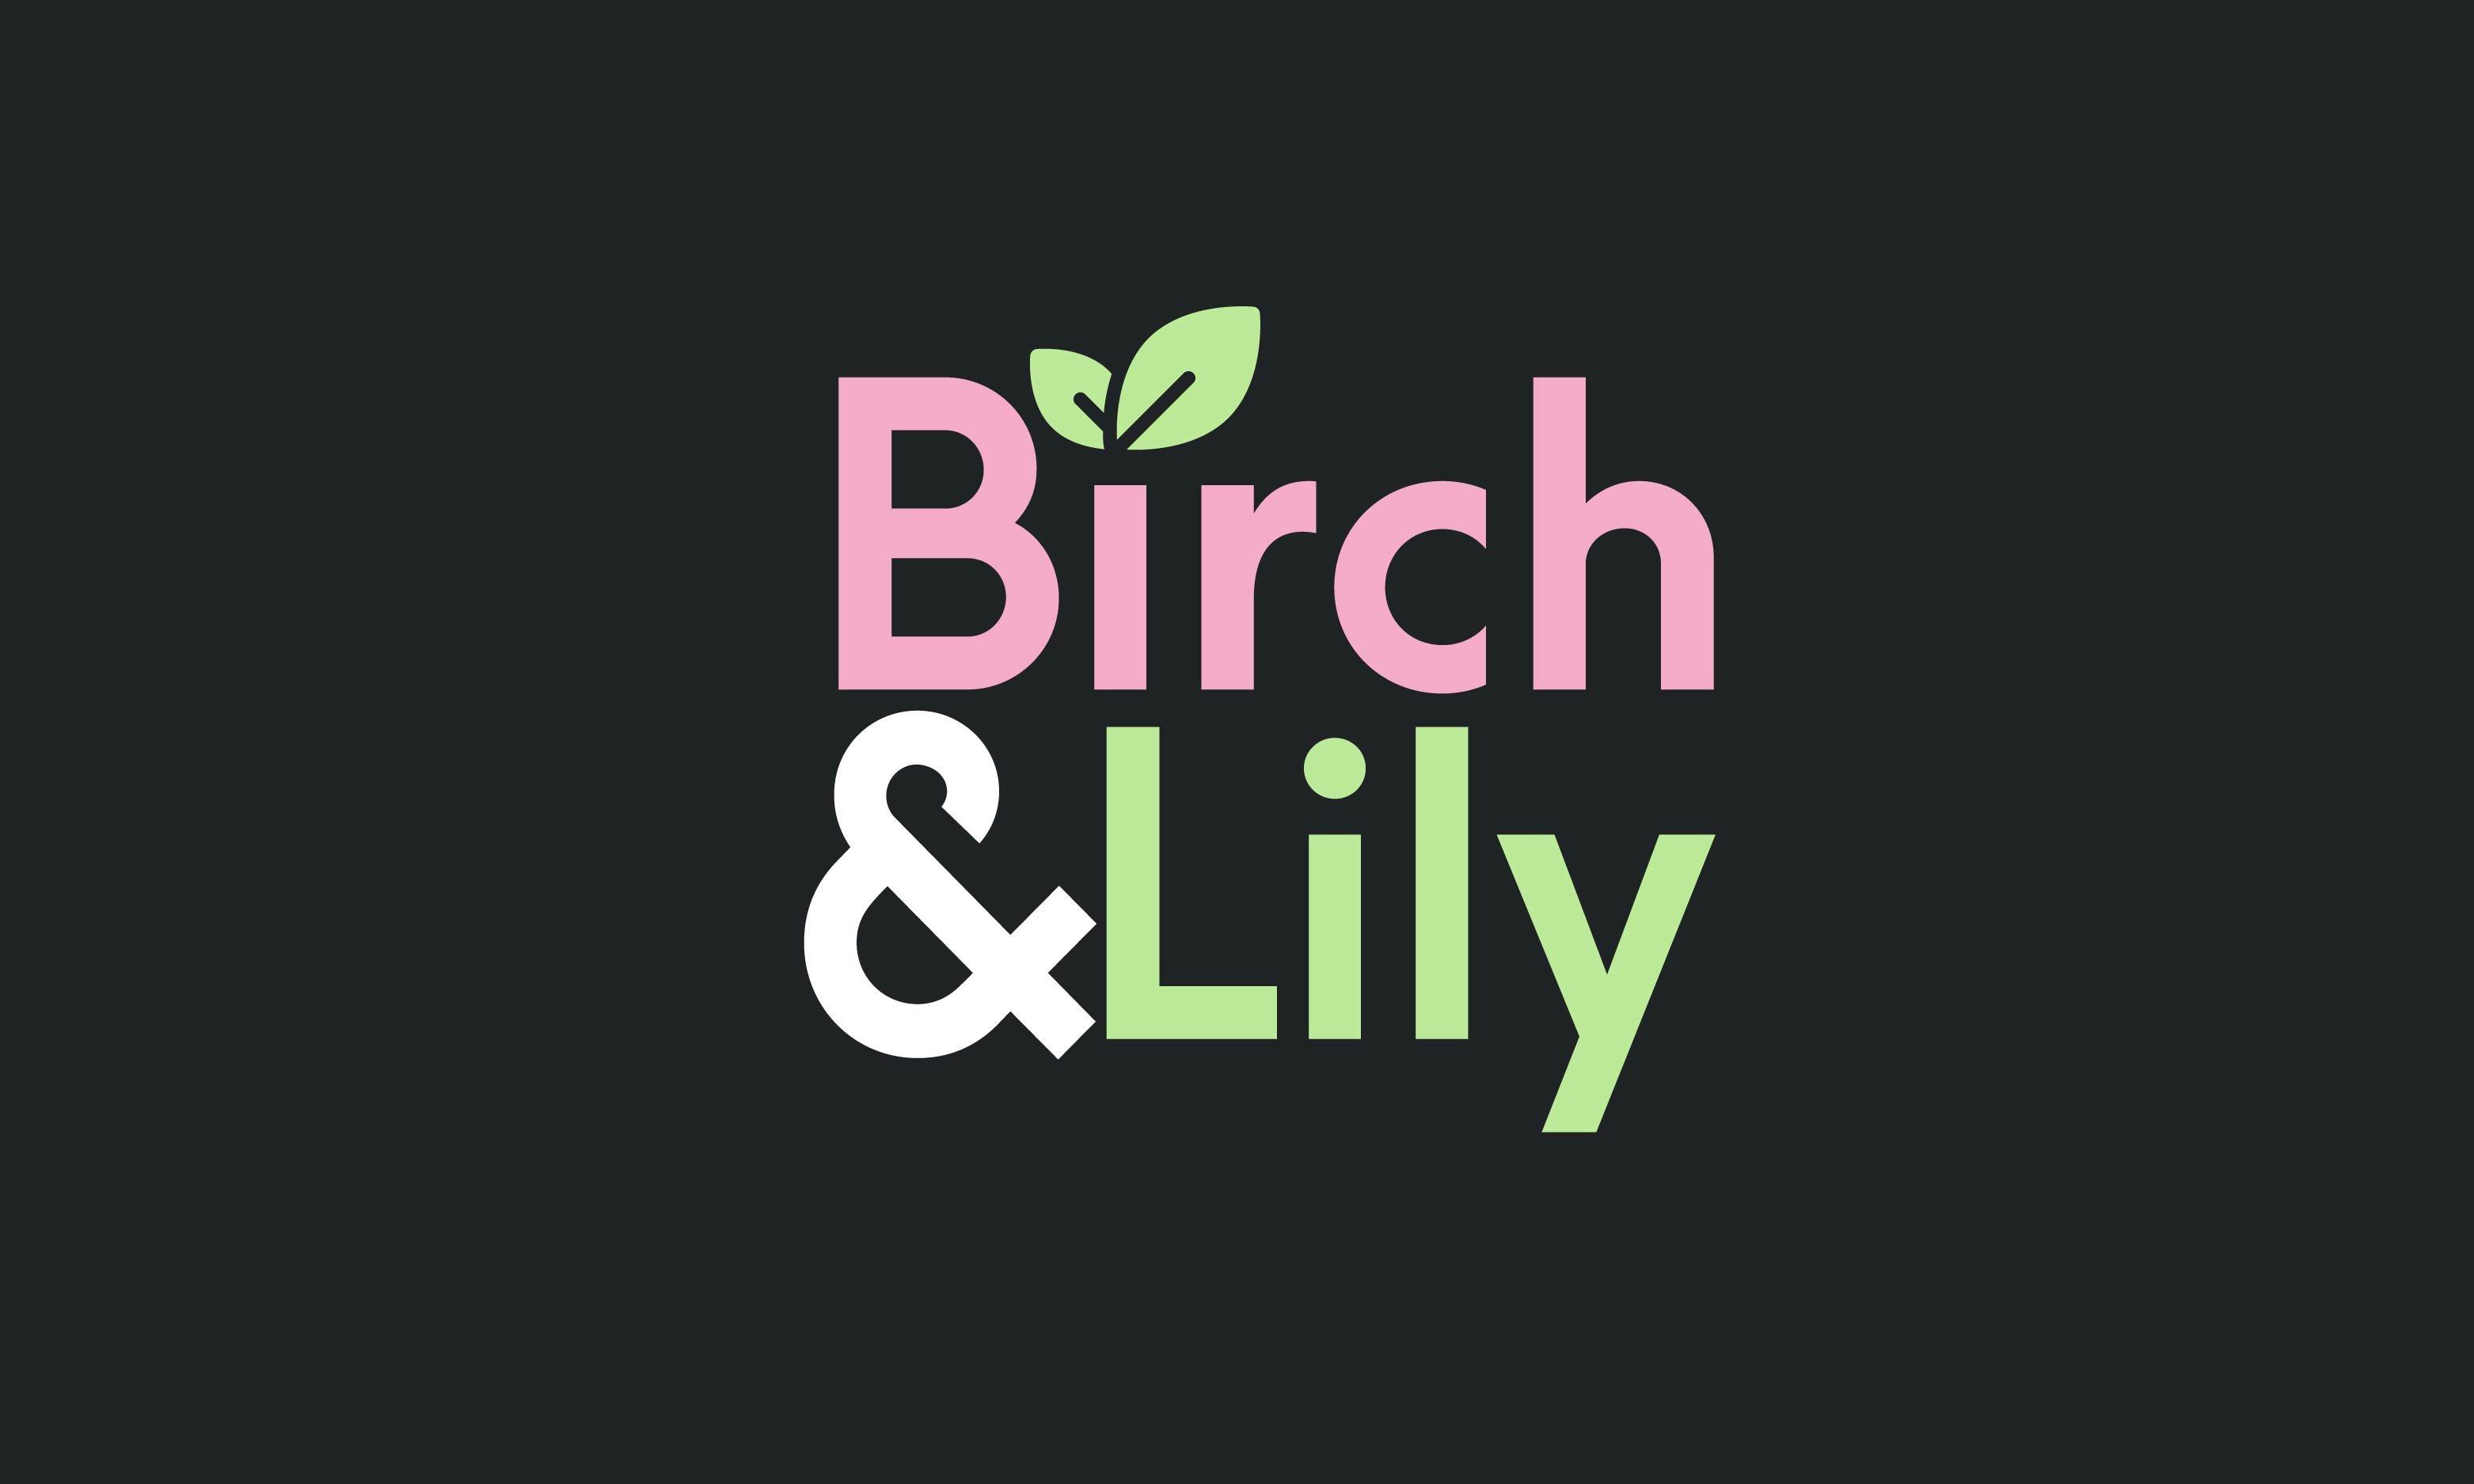 BirchAndLily.com